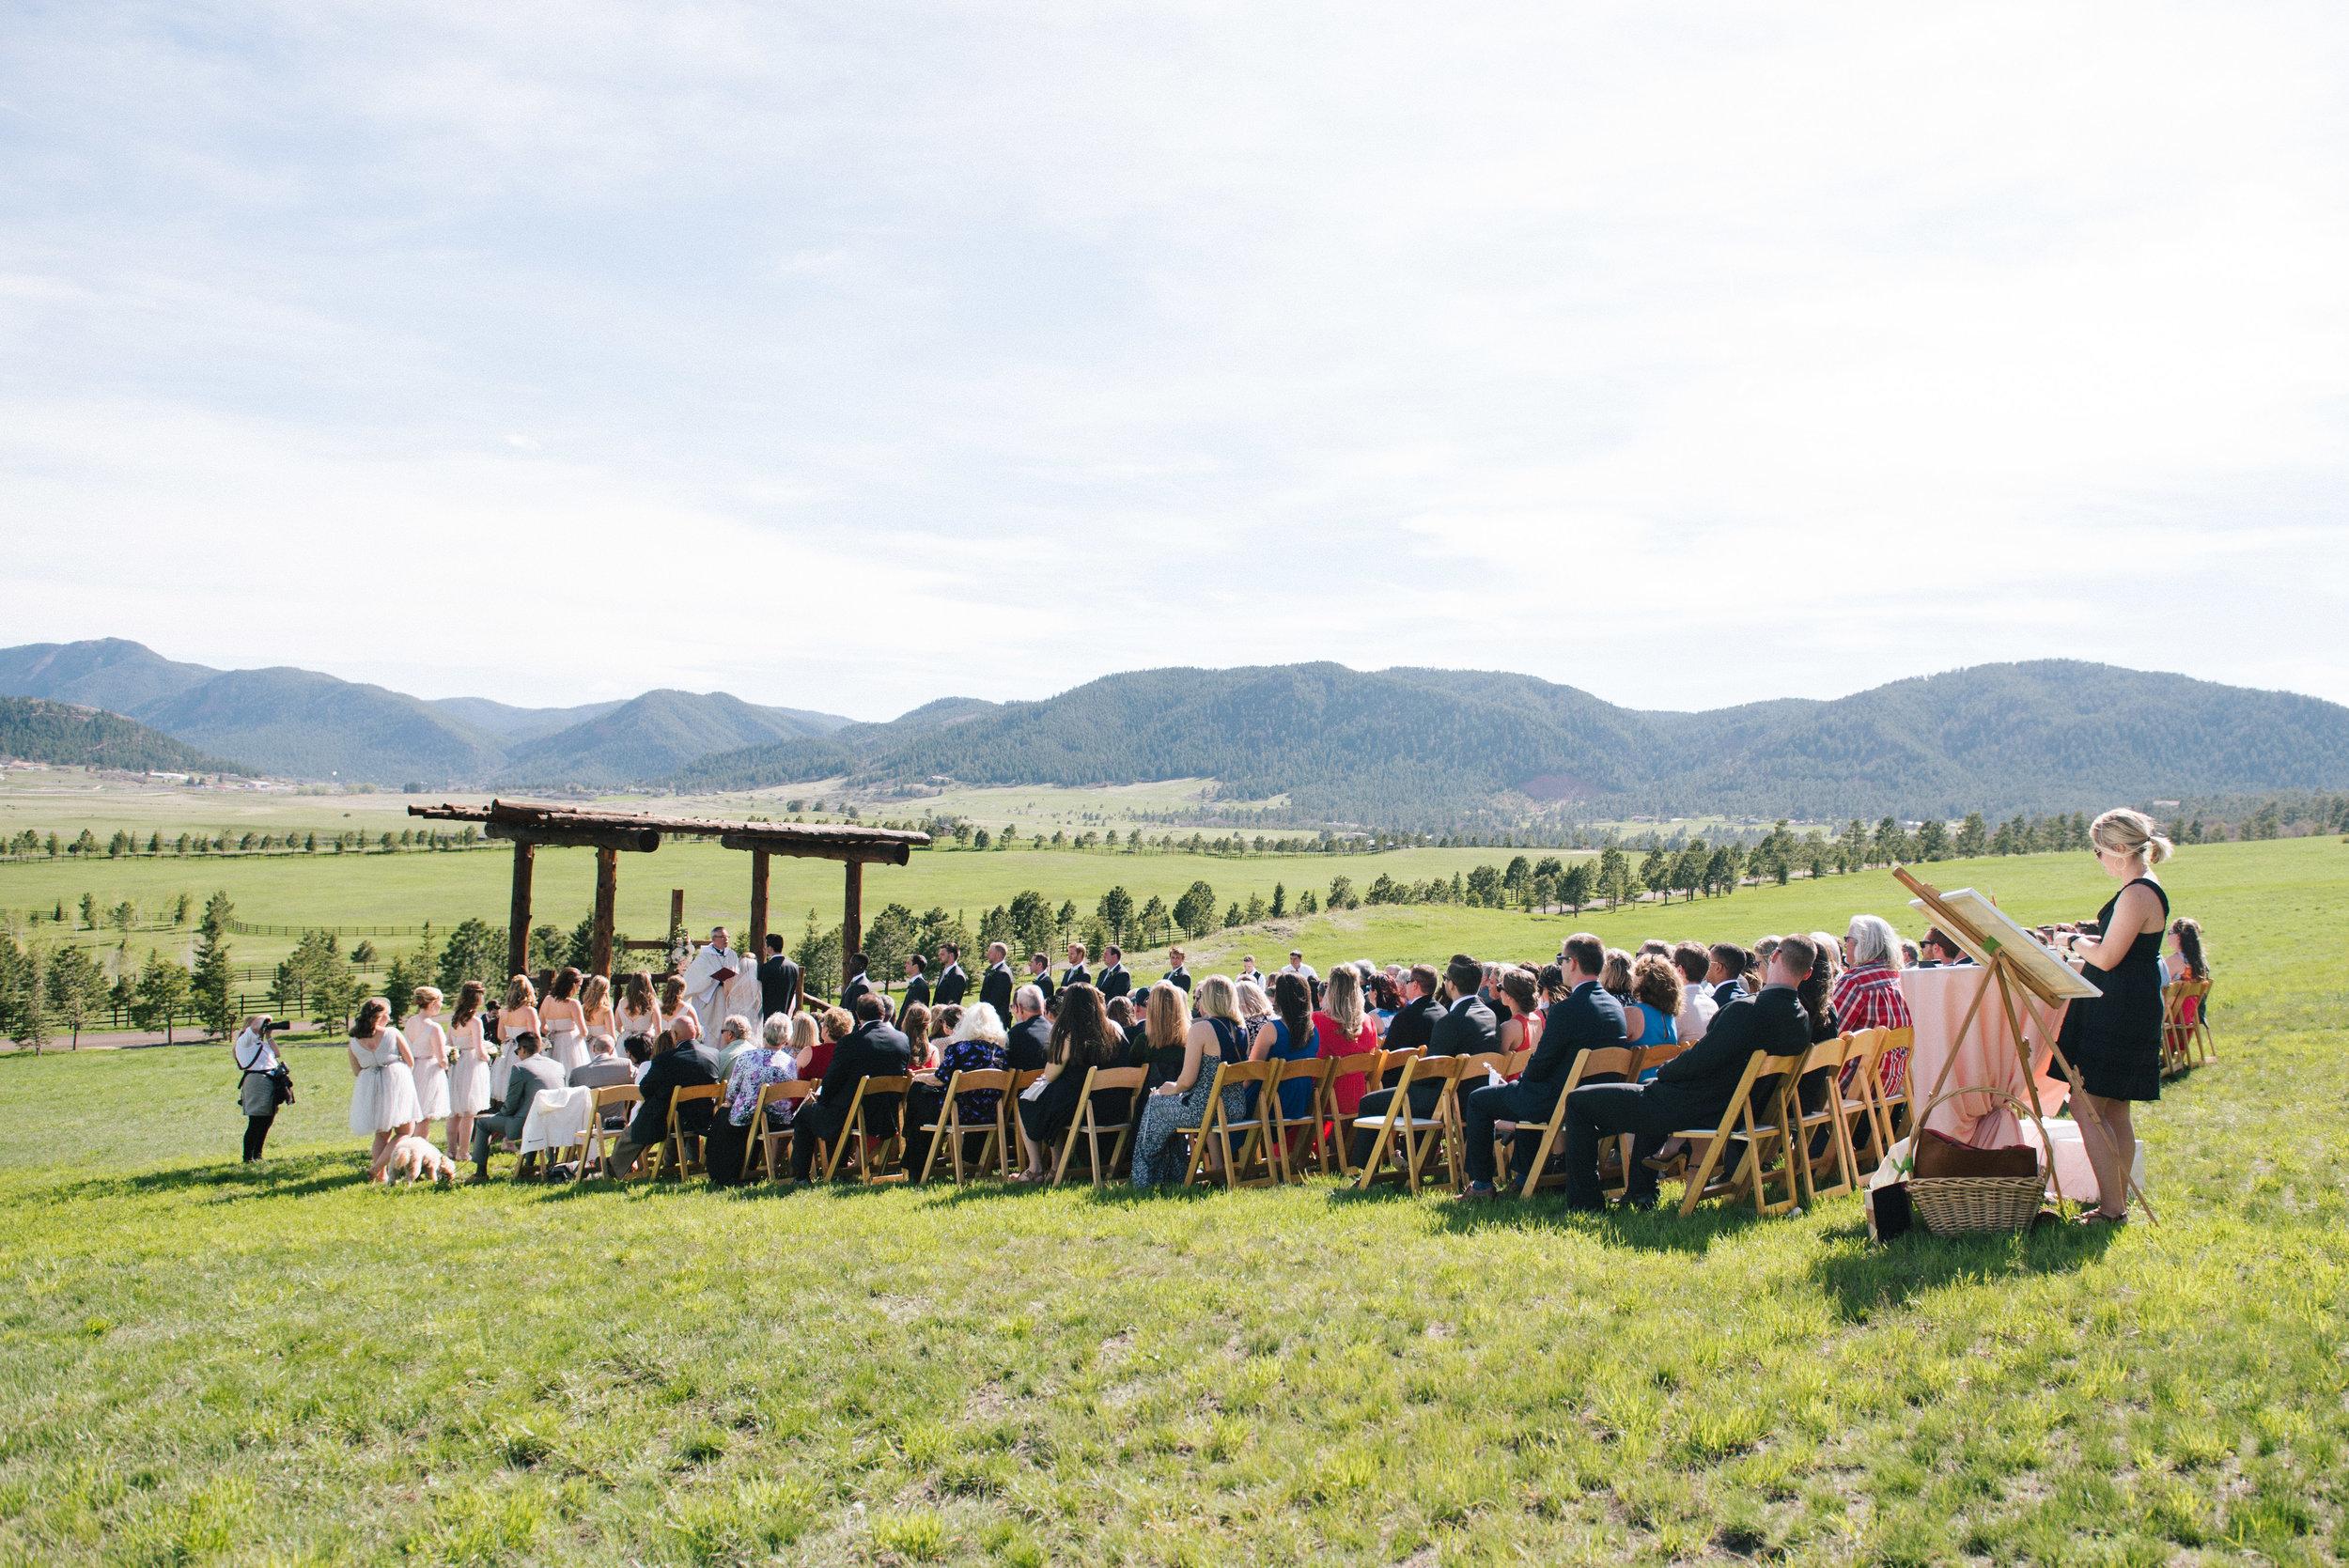 Kyle-Scott-Spruce-Mountain-wedding-by-Lisa-O'Dwyer-517.jpg